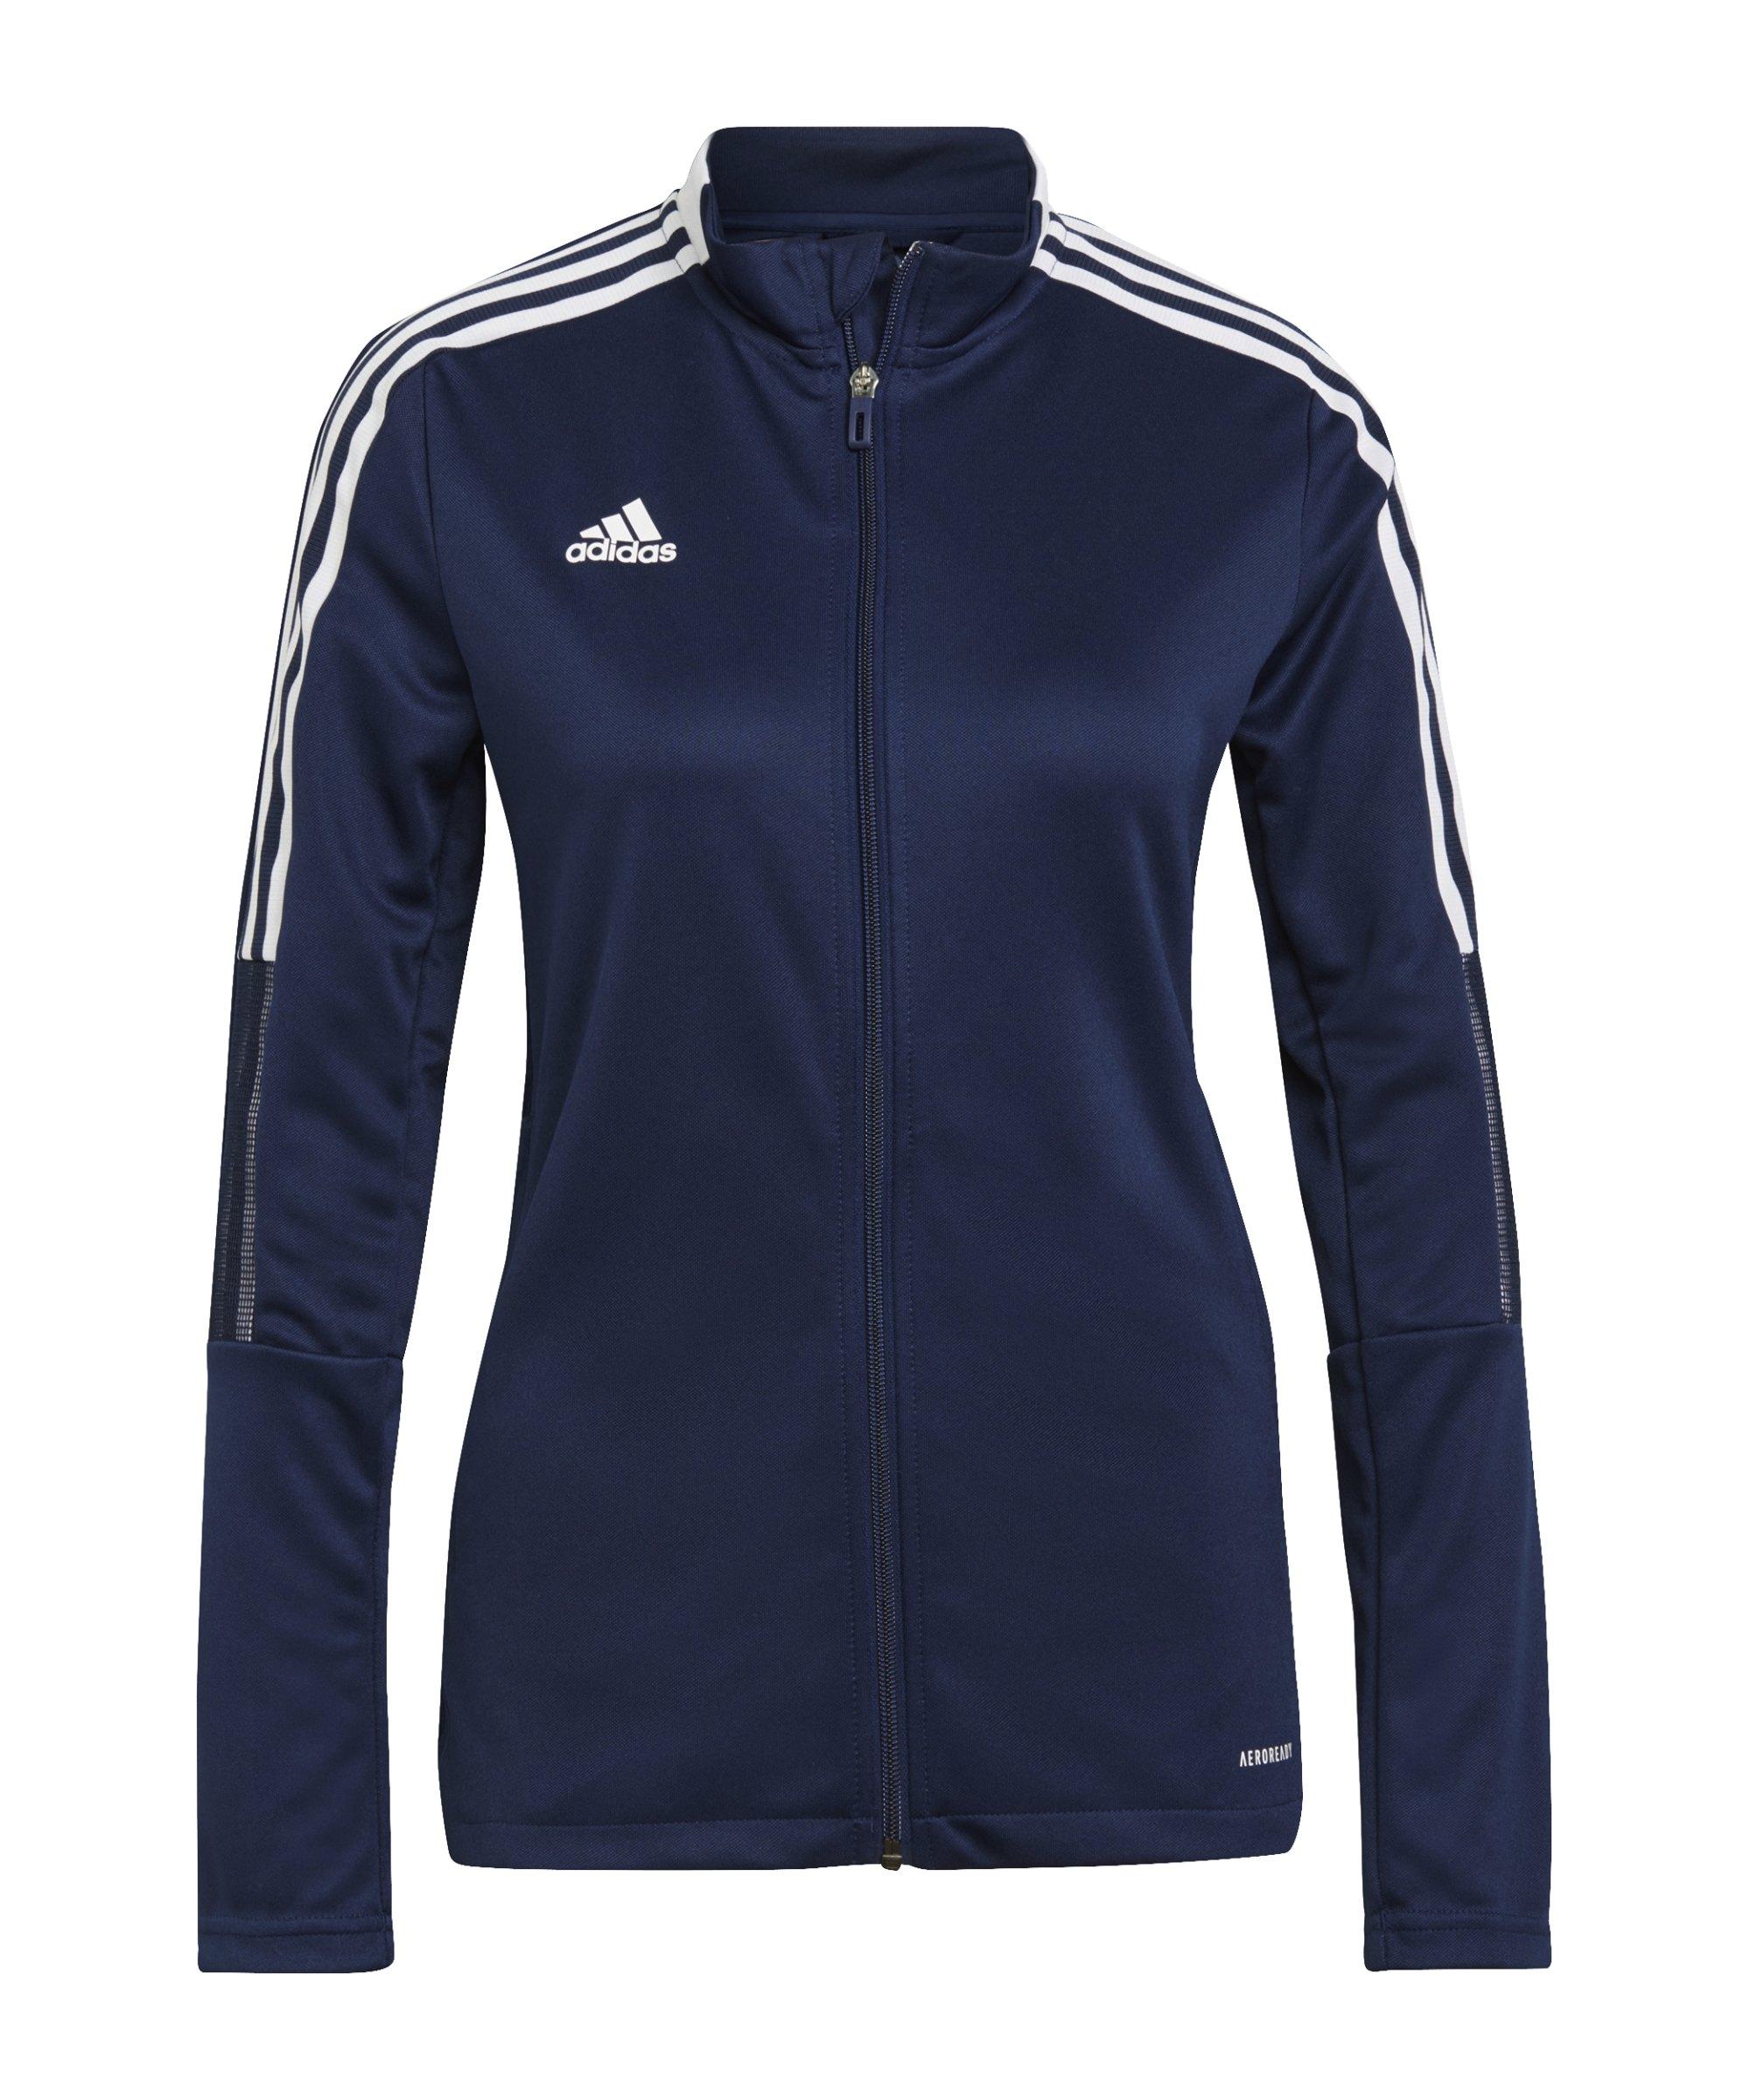 adidas Tiro 21 Trainingsjacke Damen Dunkelblau - blau